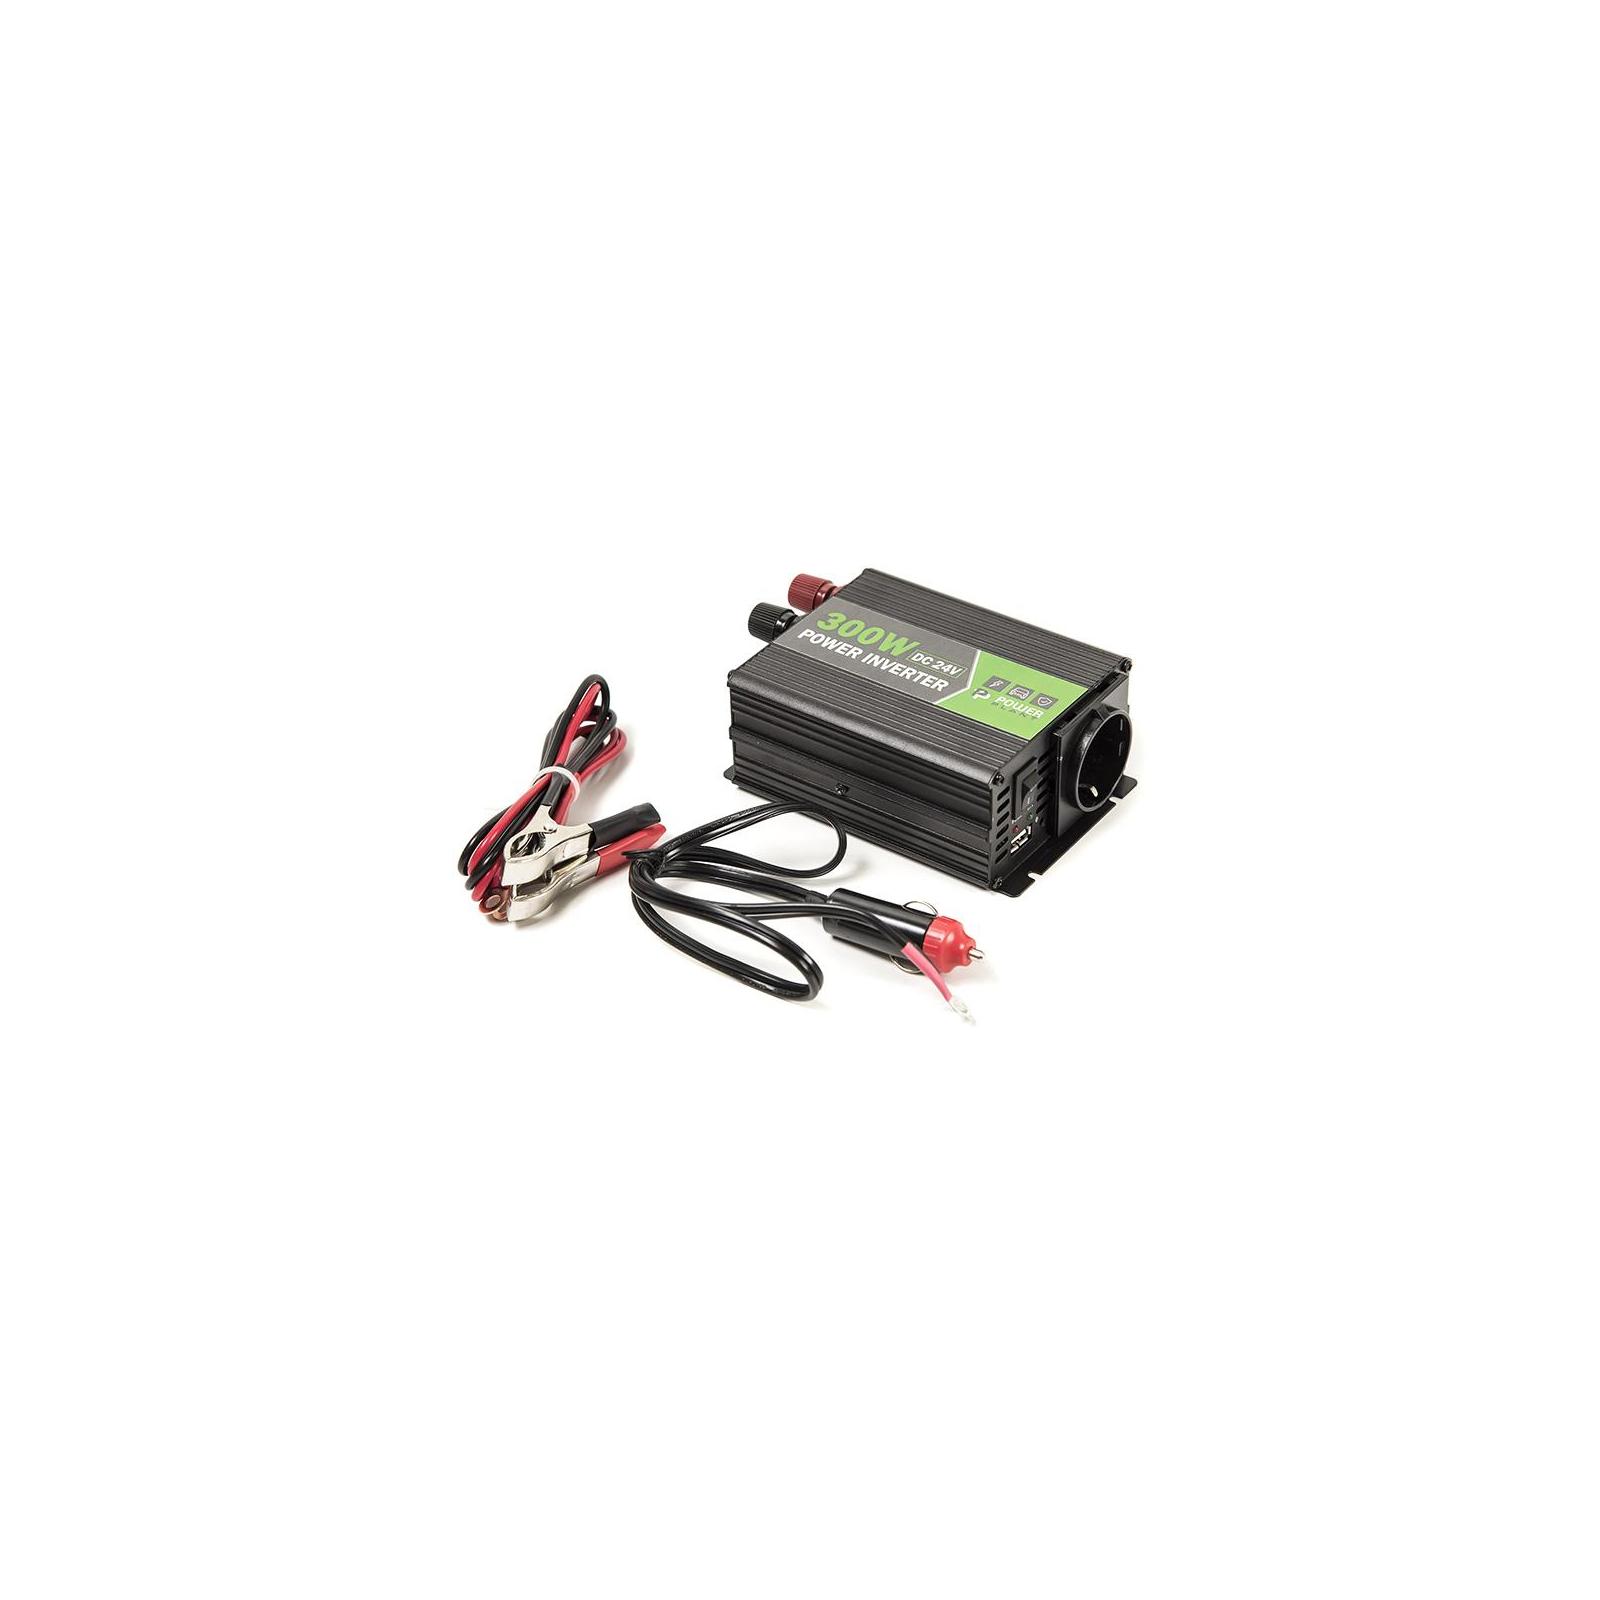 Автомобильный инвертор 24V/220V 300W, USB 5V 1A, HYM300-242 PowerPlant (KD00MS0002) изображение 7